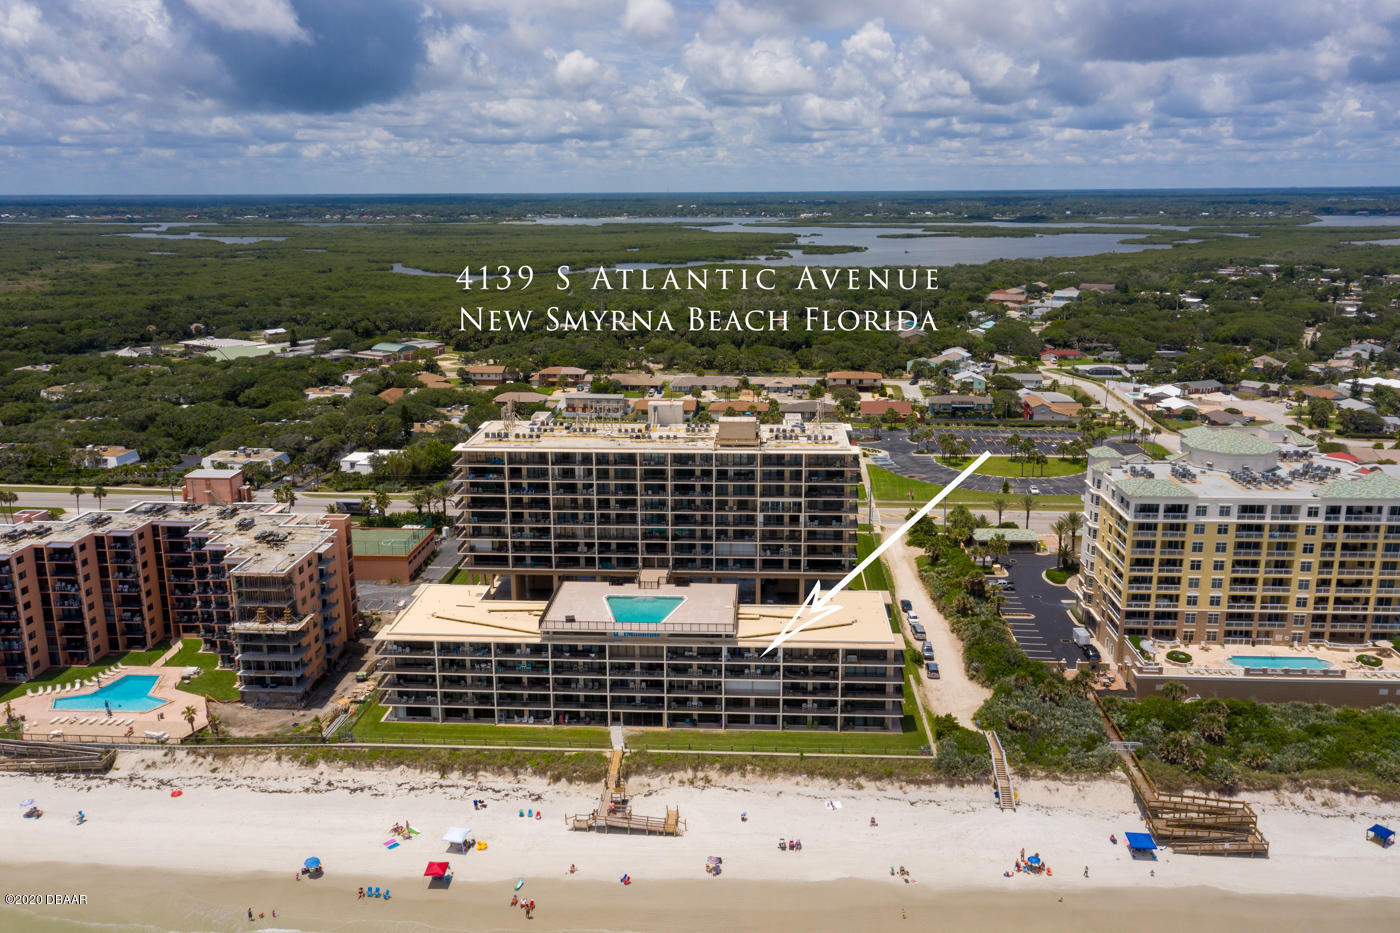 4139 S Atlantic Avenue New Smyrna Beach Fl 32169 For